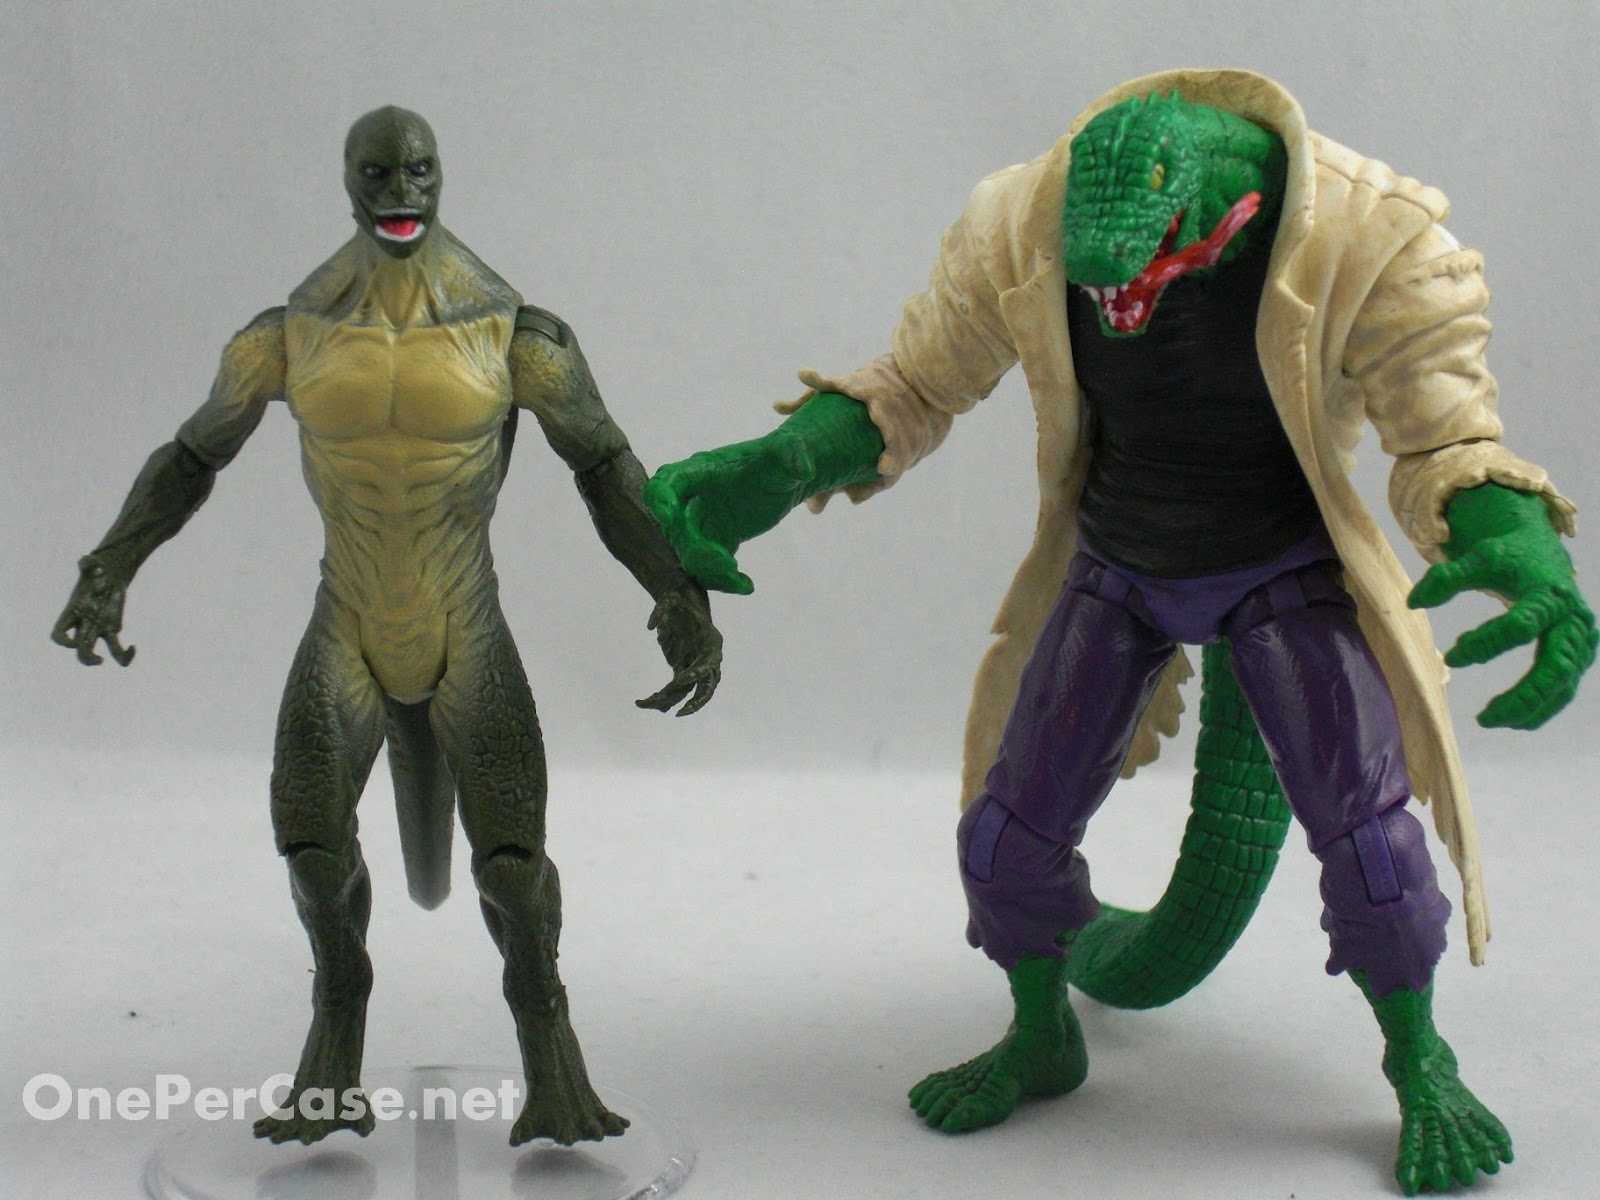 Must see Wallpaper Marvel Lizard - Hasbro+Marvel+Universe+The+Amazing+Spider-Man+Reptile+Blast+Lizard+Movie+Series+Action+Figure+2012+(13)  Trends_98288.JPG